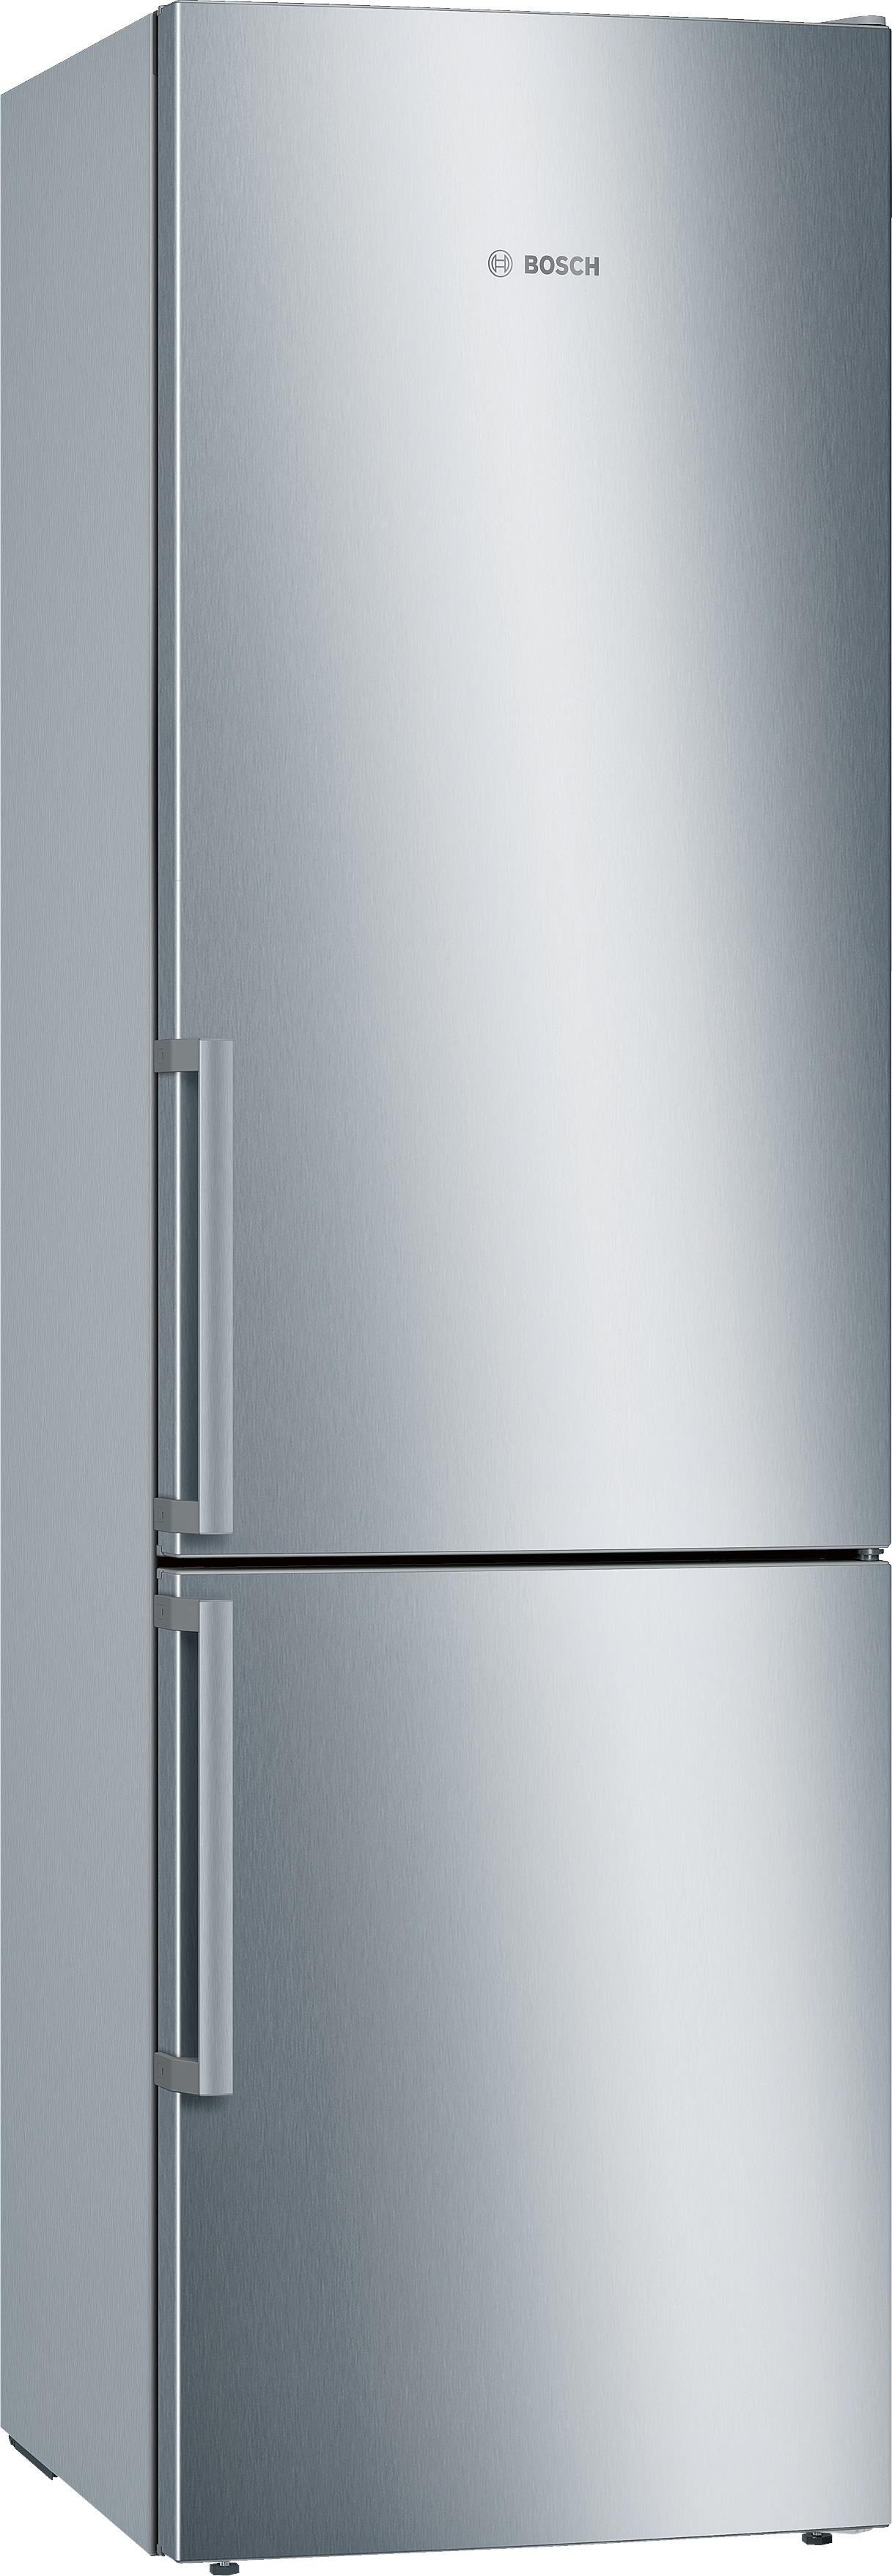 Bosch KGE39EICP Koelkast met vriesvak Aluminium